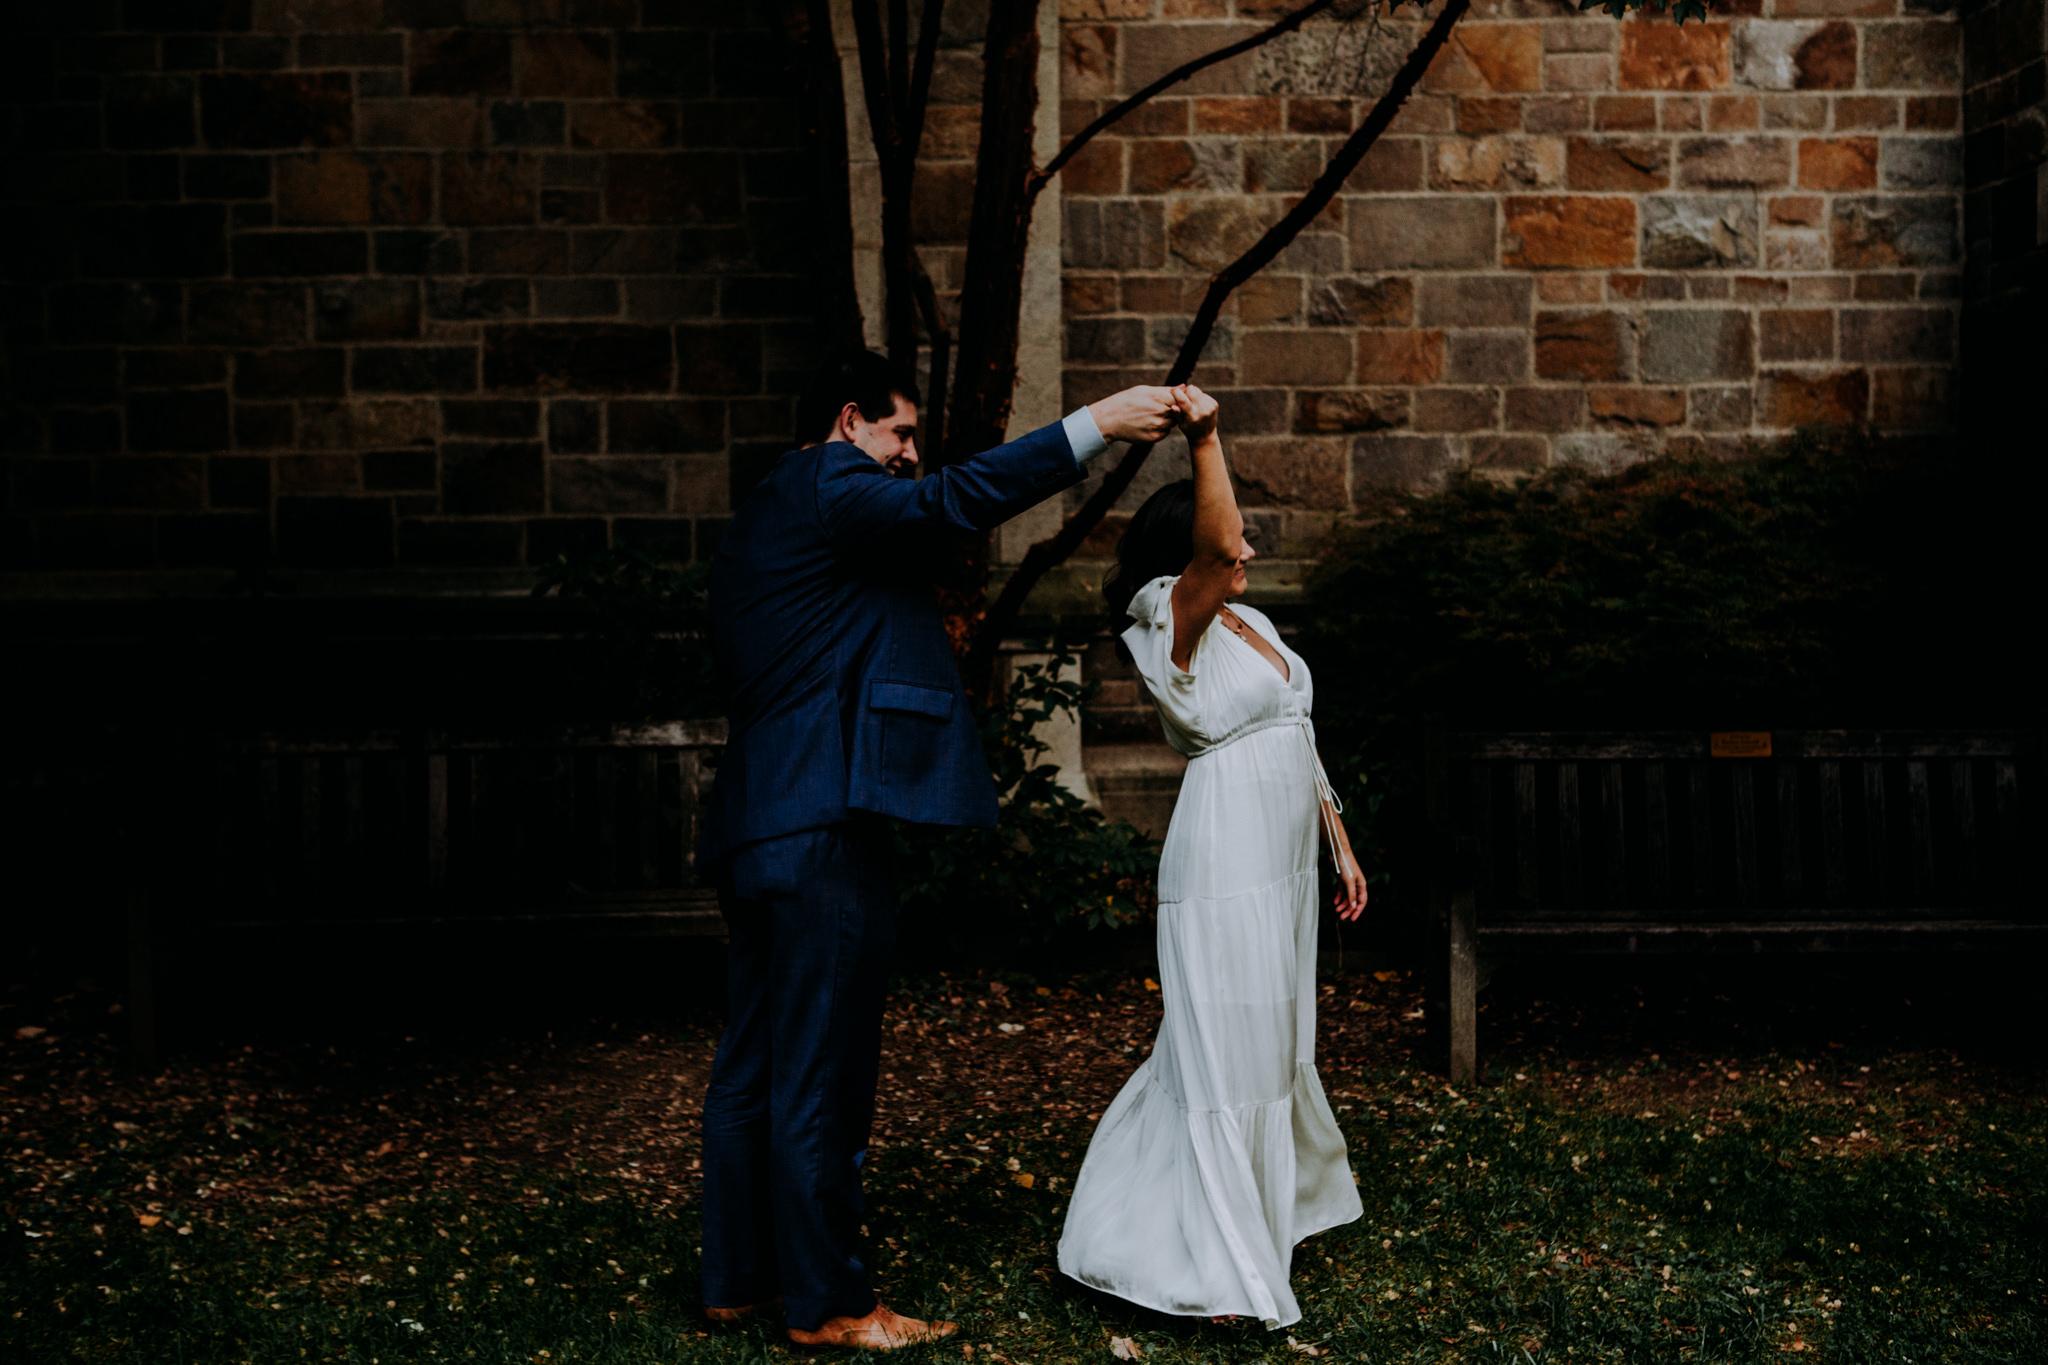 ann-arbor-engagement-photographer